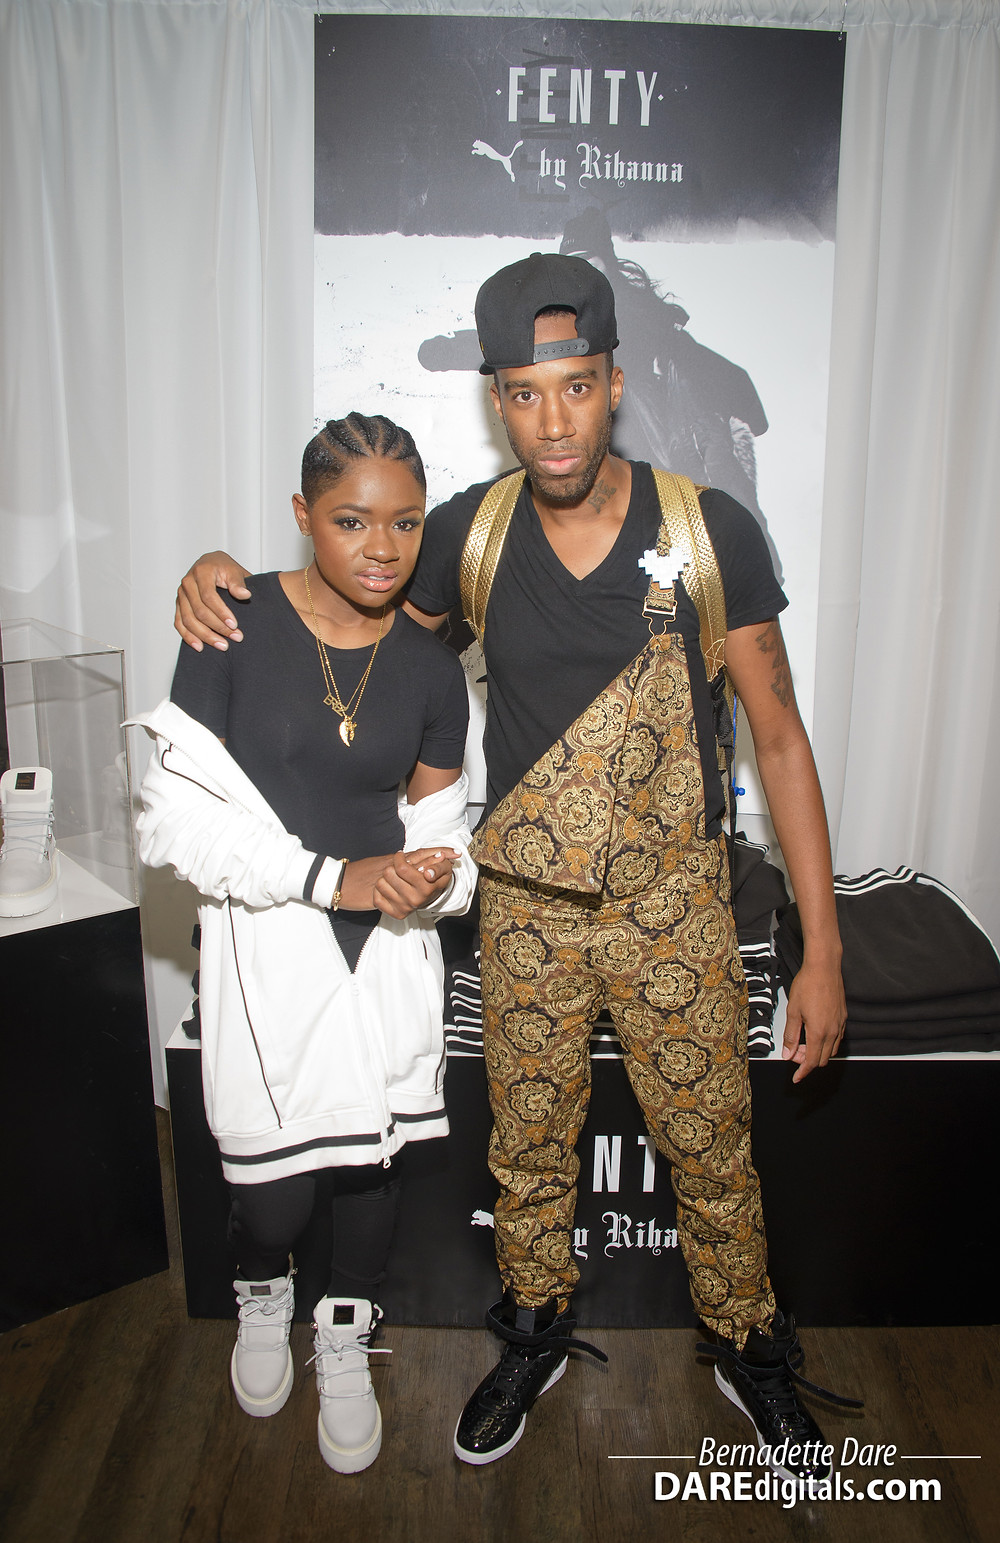 Bre-Z (Empire) with Desmond Handon a Rihanna's Fenty debut